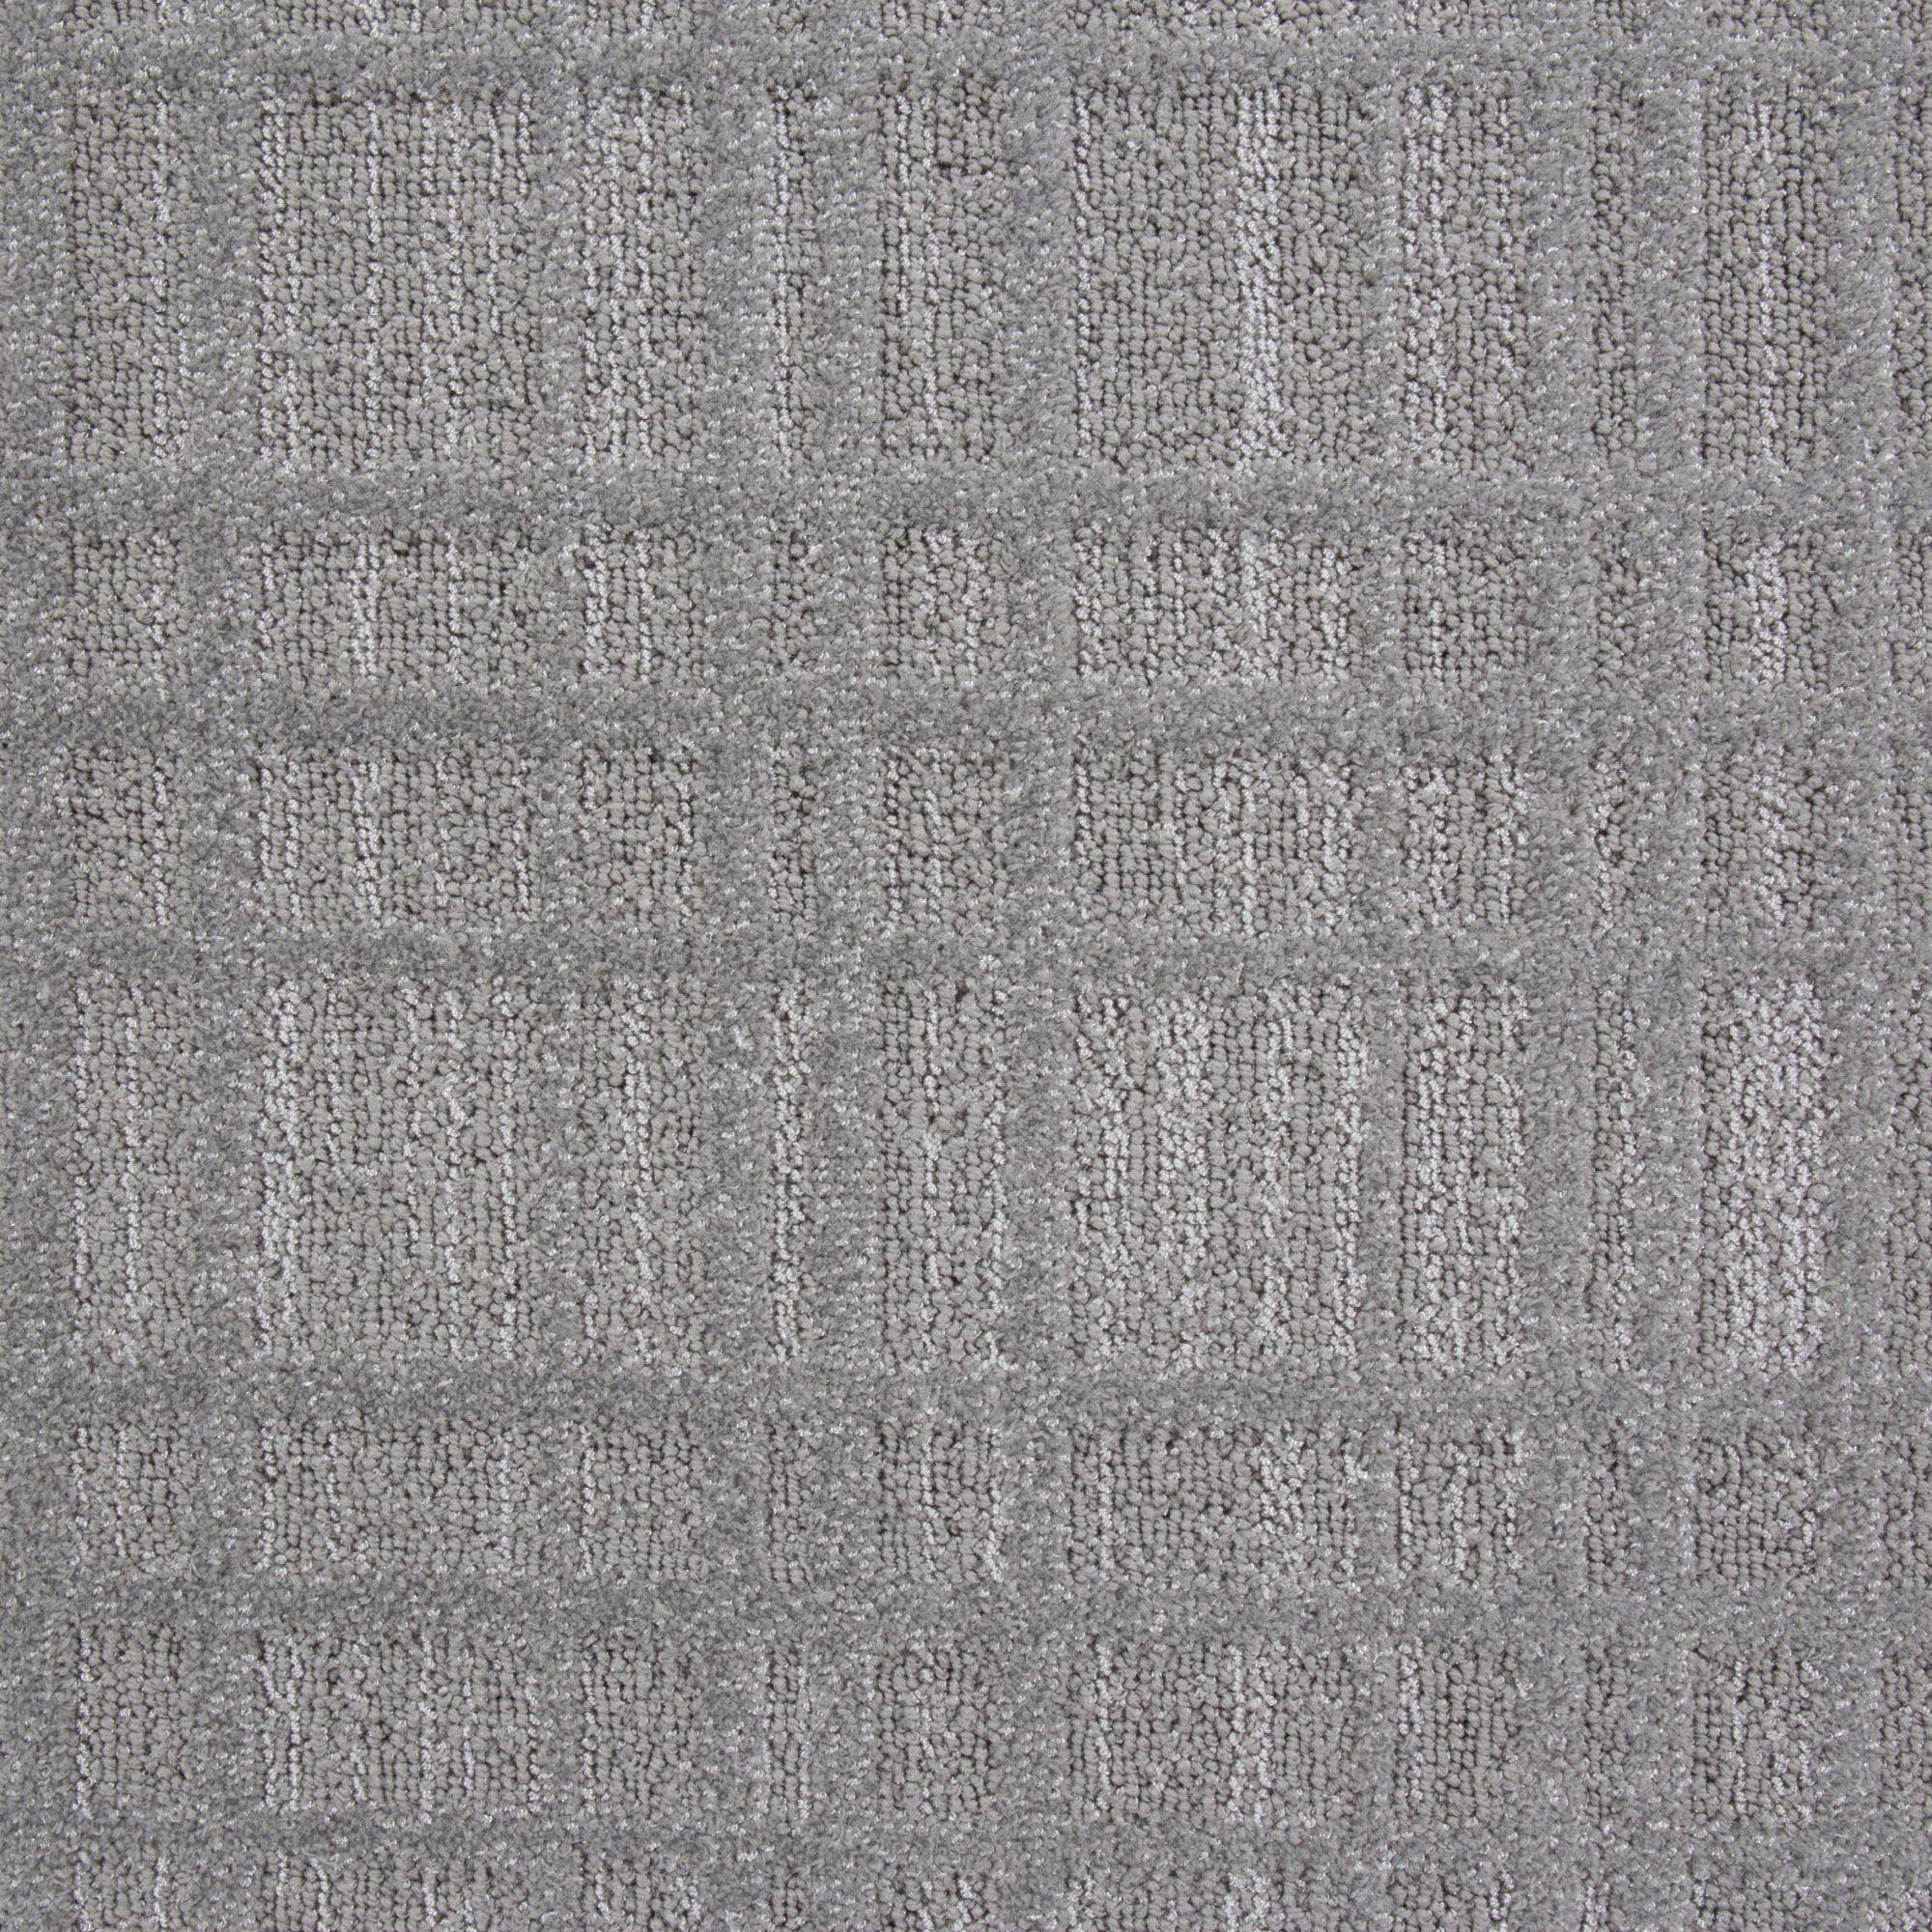 Cross Section (2060-B0226)